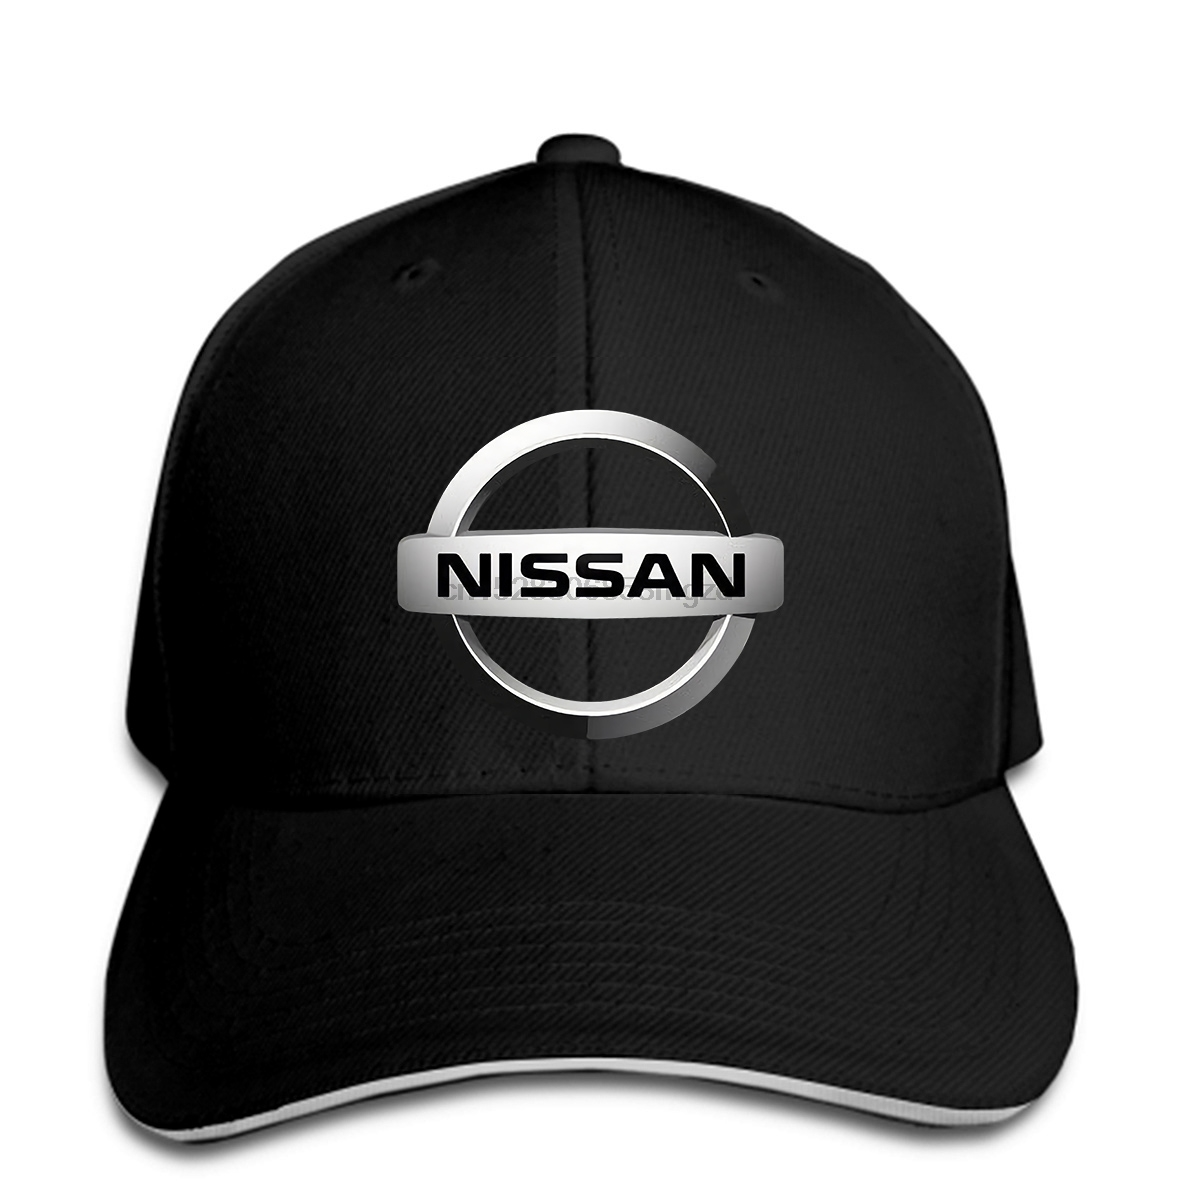 Nissan Logo Automotif Cars Men Baseball Cap Black New Snapback Cap Women Hat Peaked